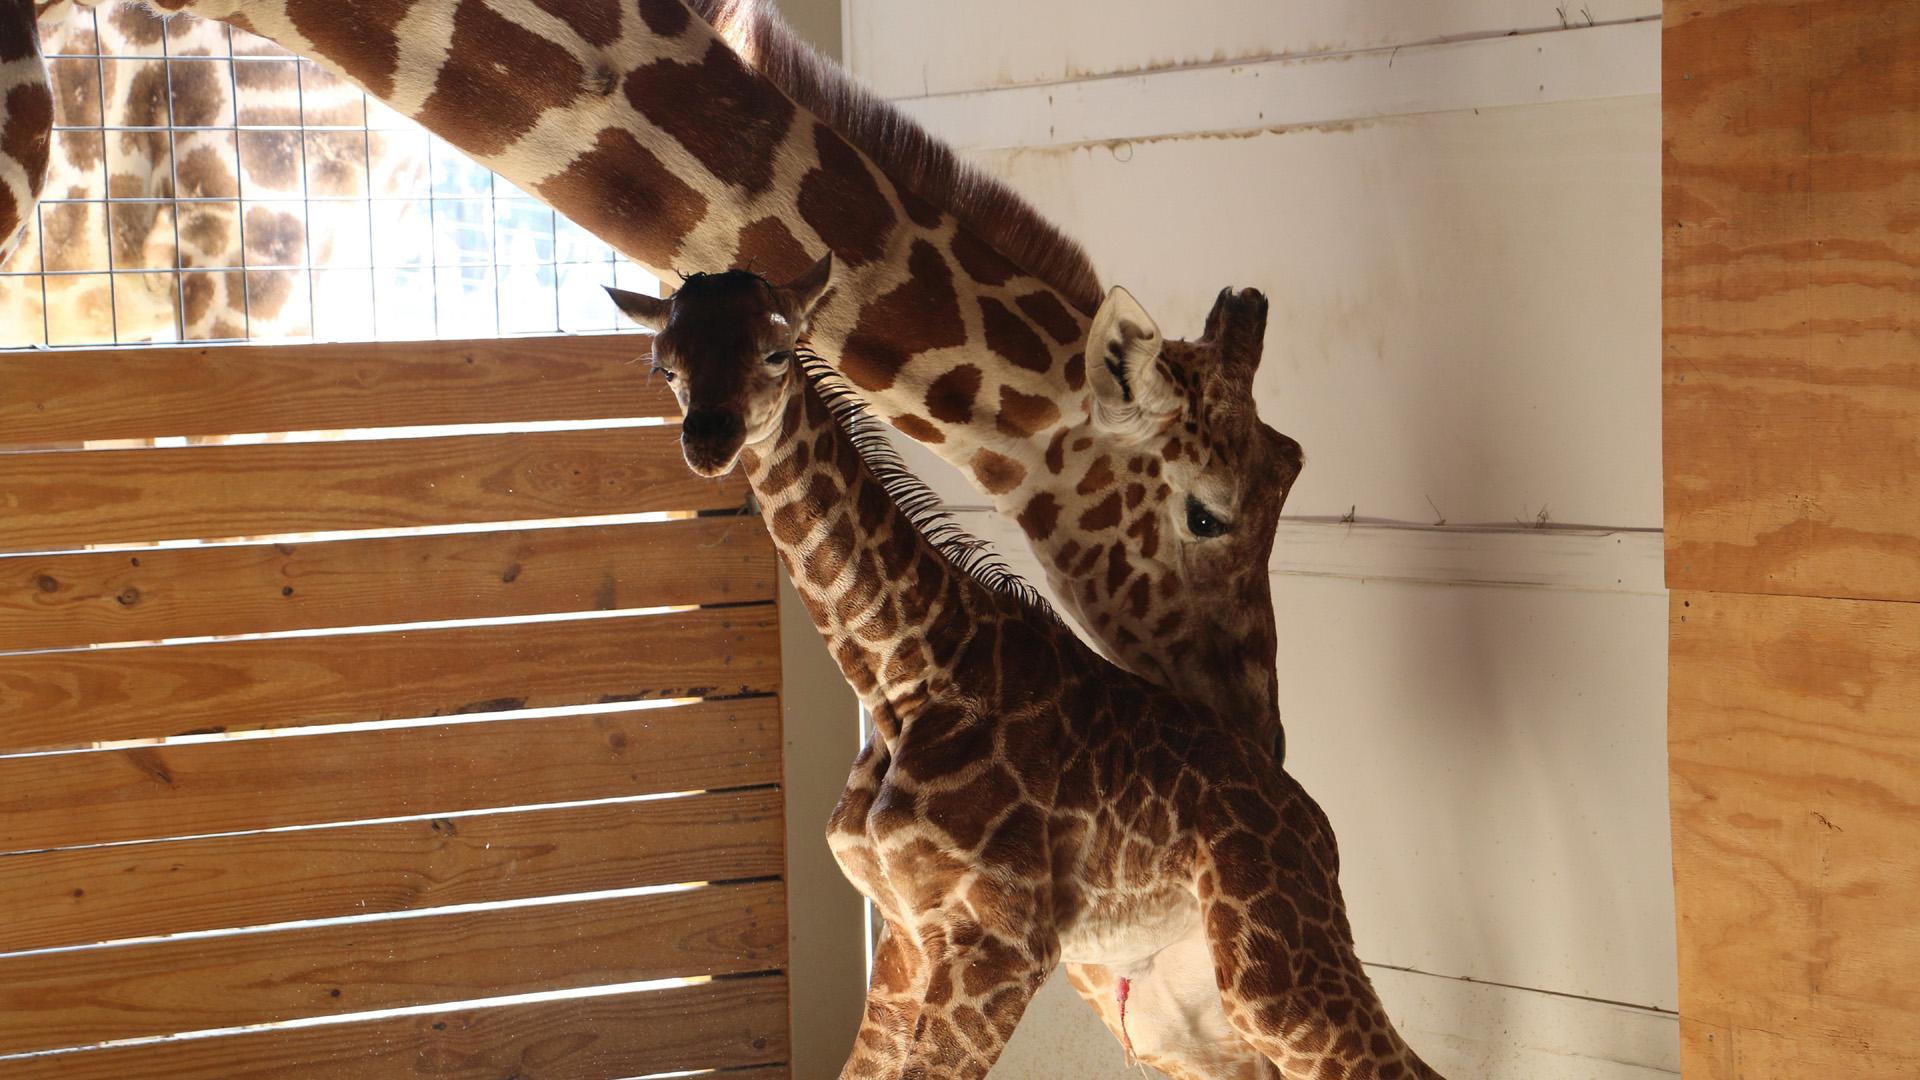 april giraffe and her calf_1492297688788-159532.jpg32603505